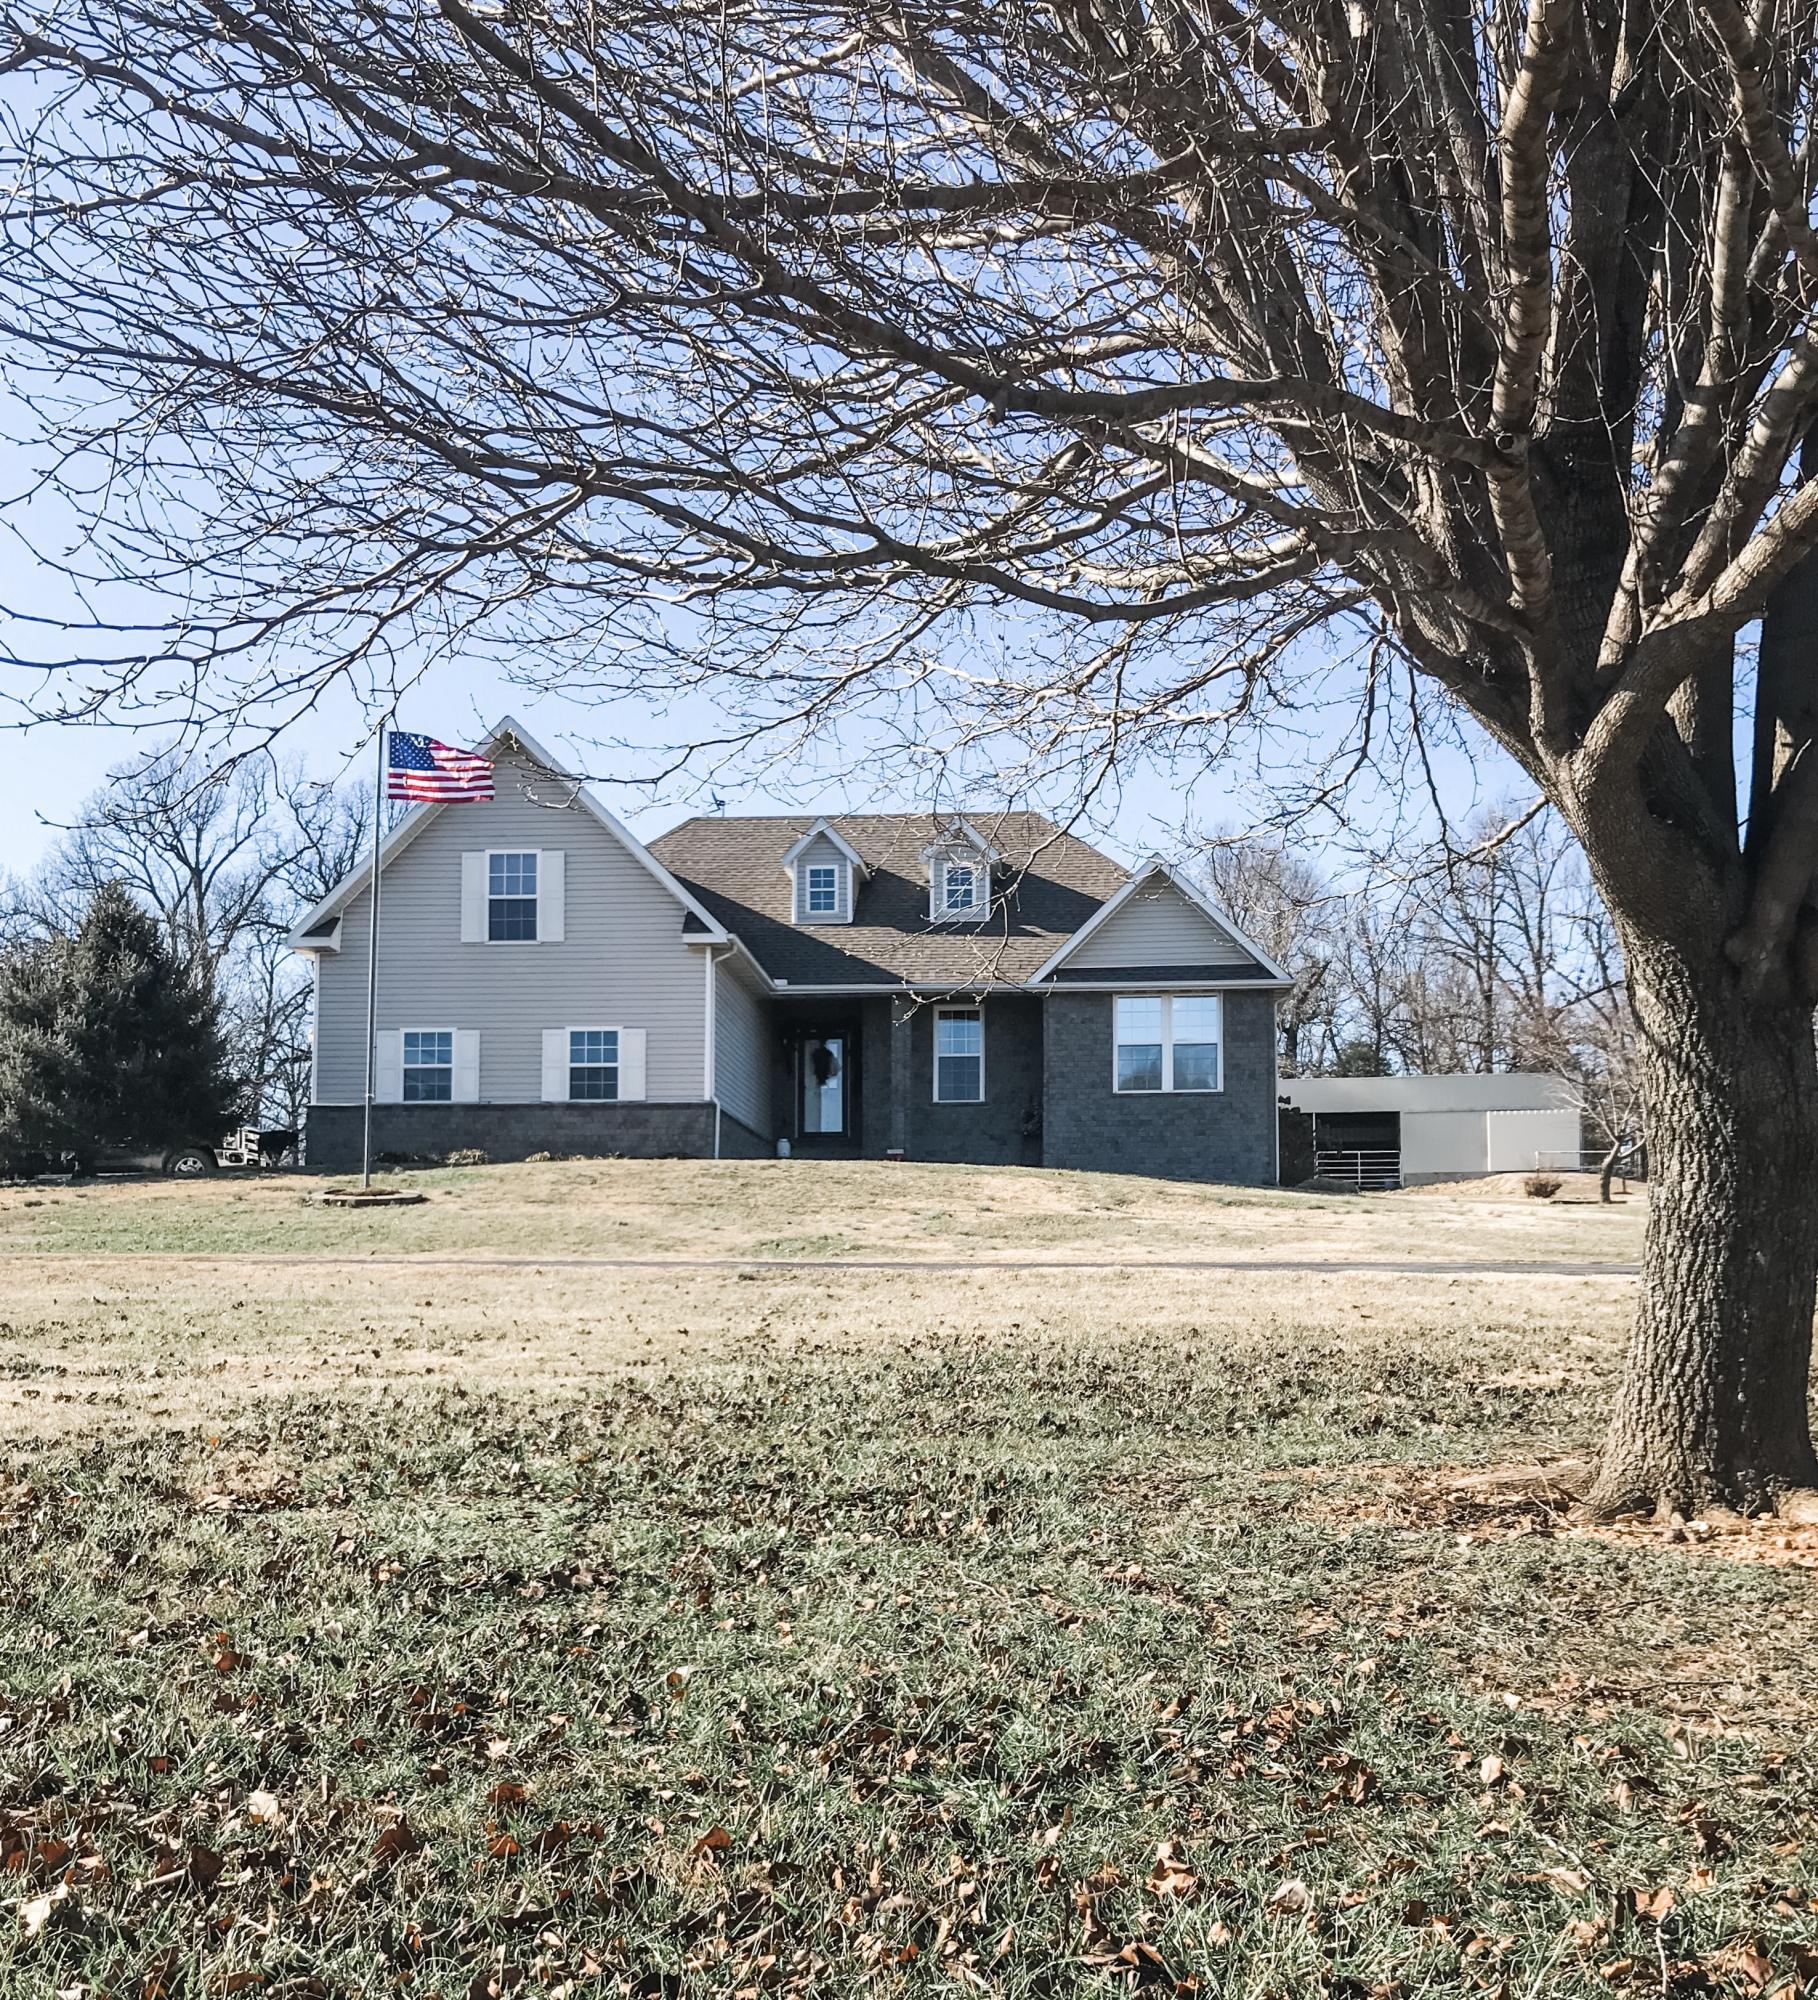 7480 Lawrence Ash Grove, MO 65604